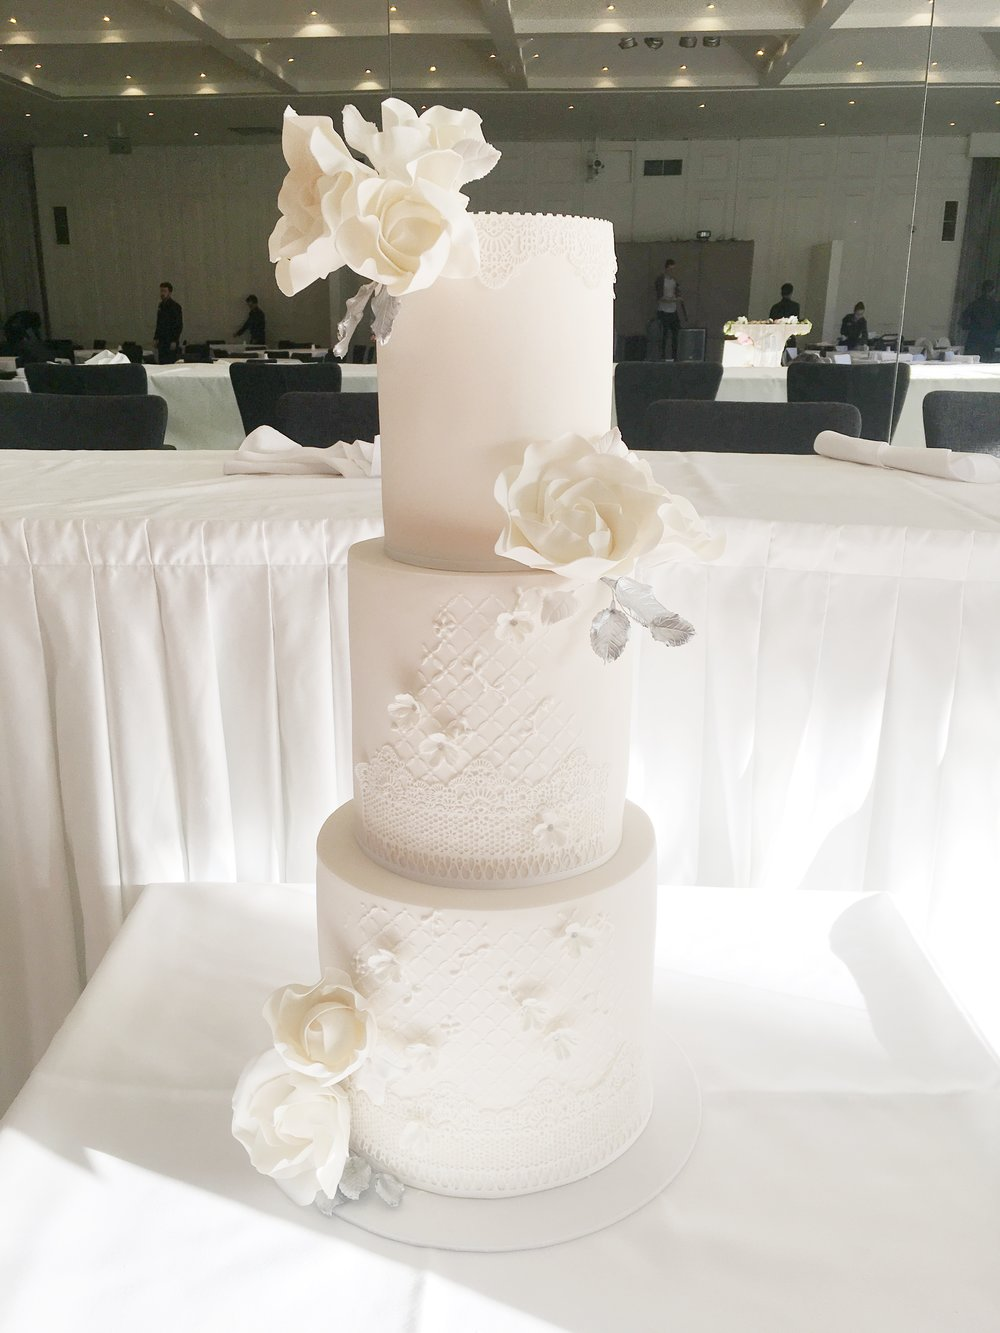 White Wedding Cake with Sugar Flowers